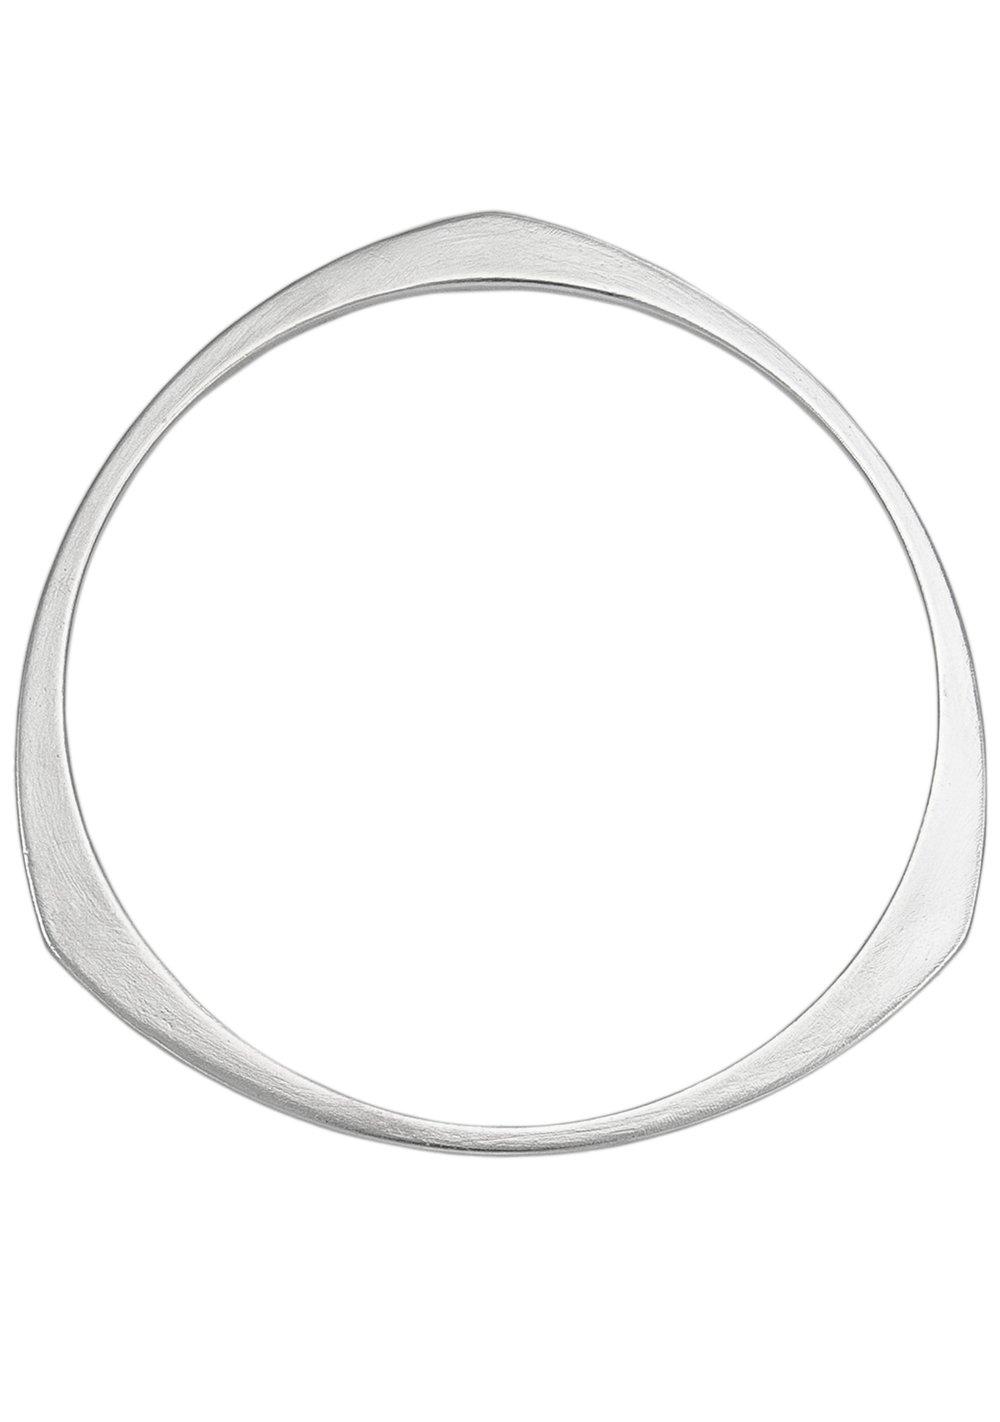 kozminka-bracelet-bangle-plain-silver.jpg